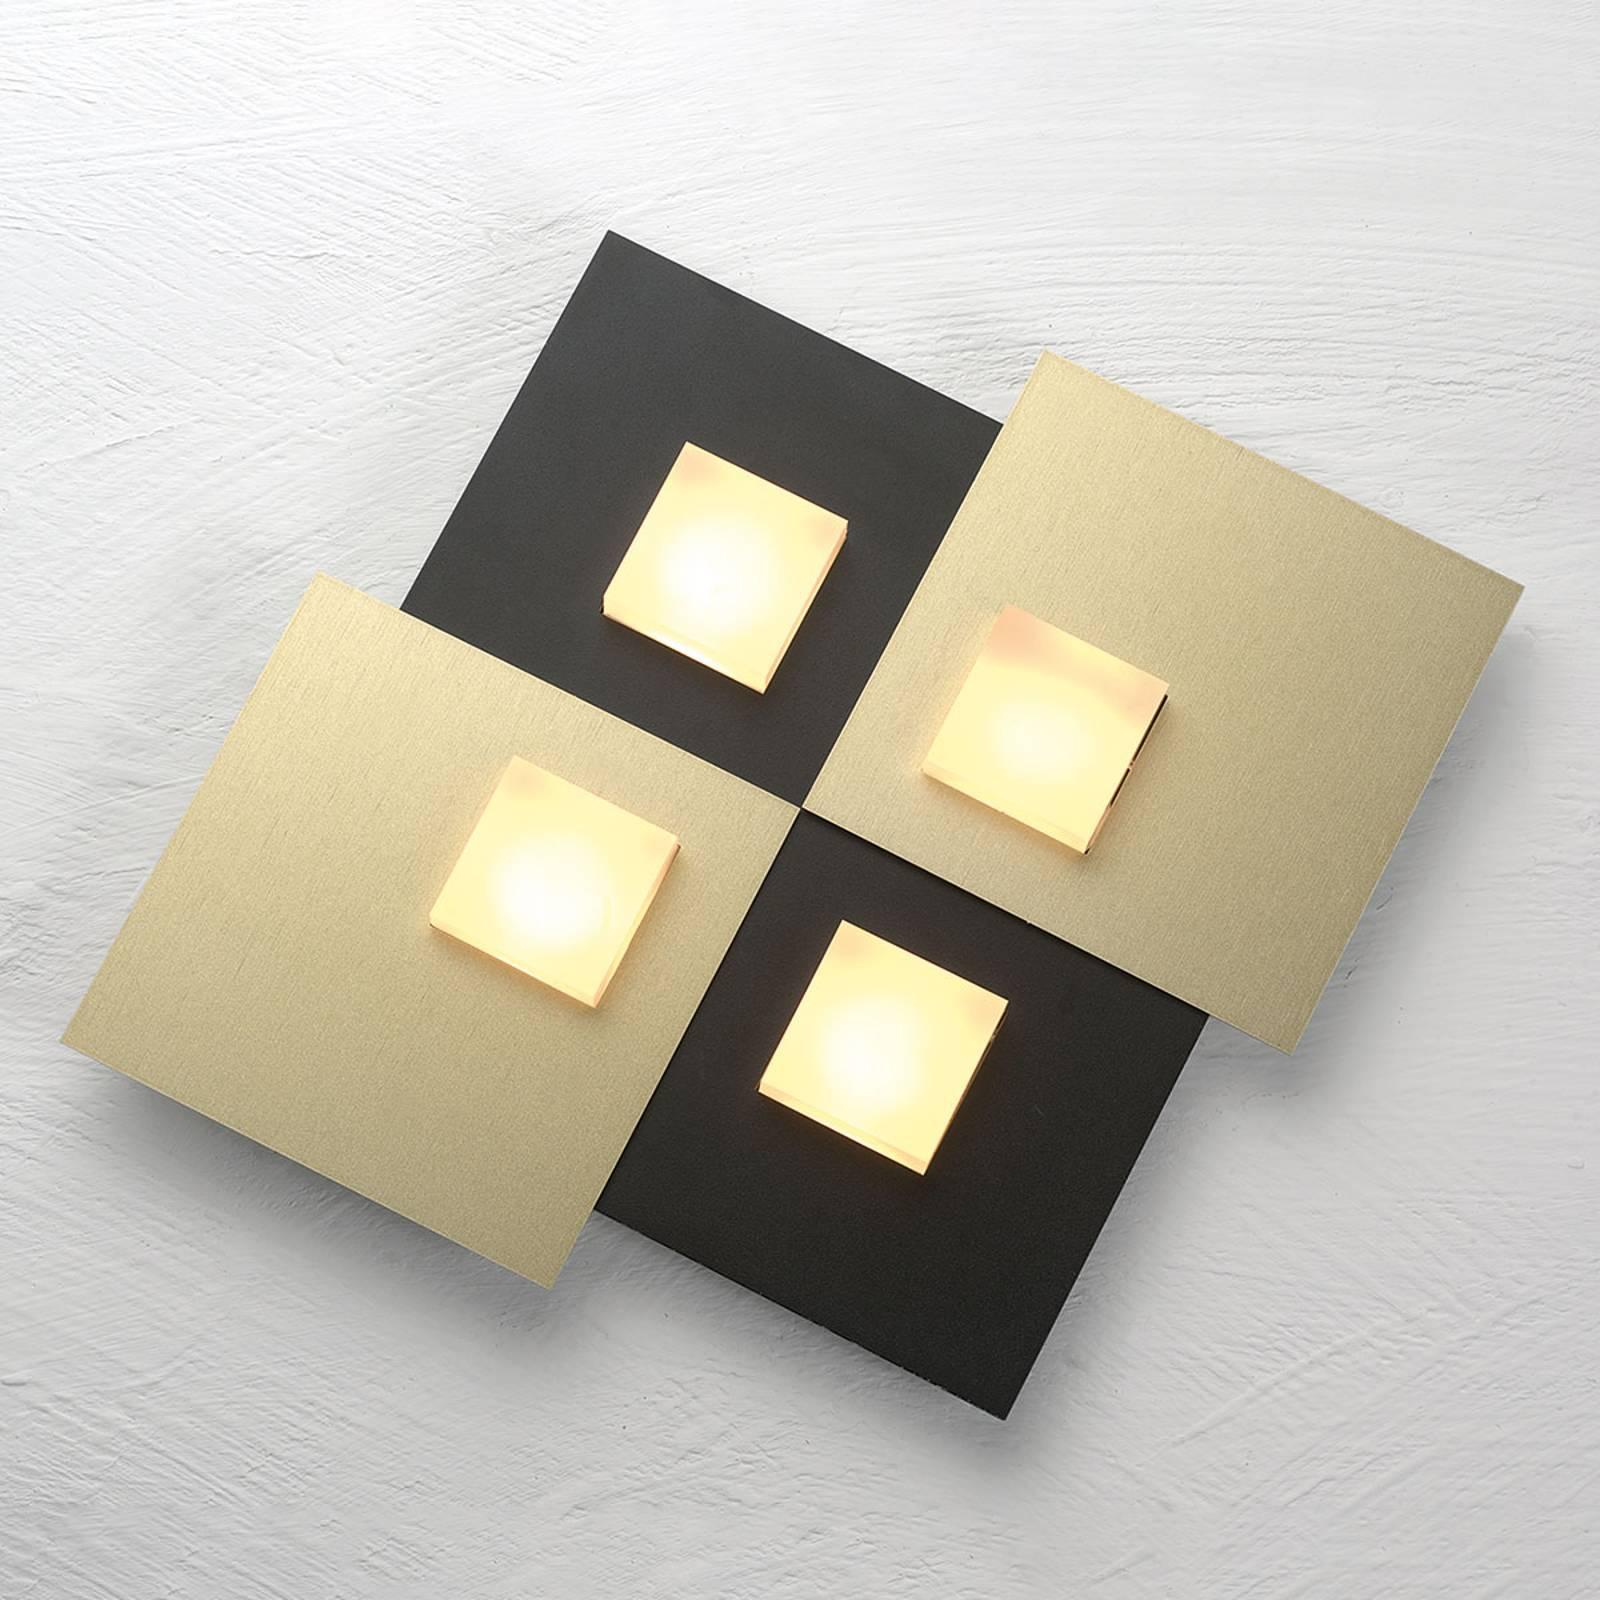 Bopp Pixel 2.0 lampa sufitowa LED 4-pkt. czarna